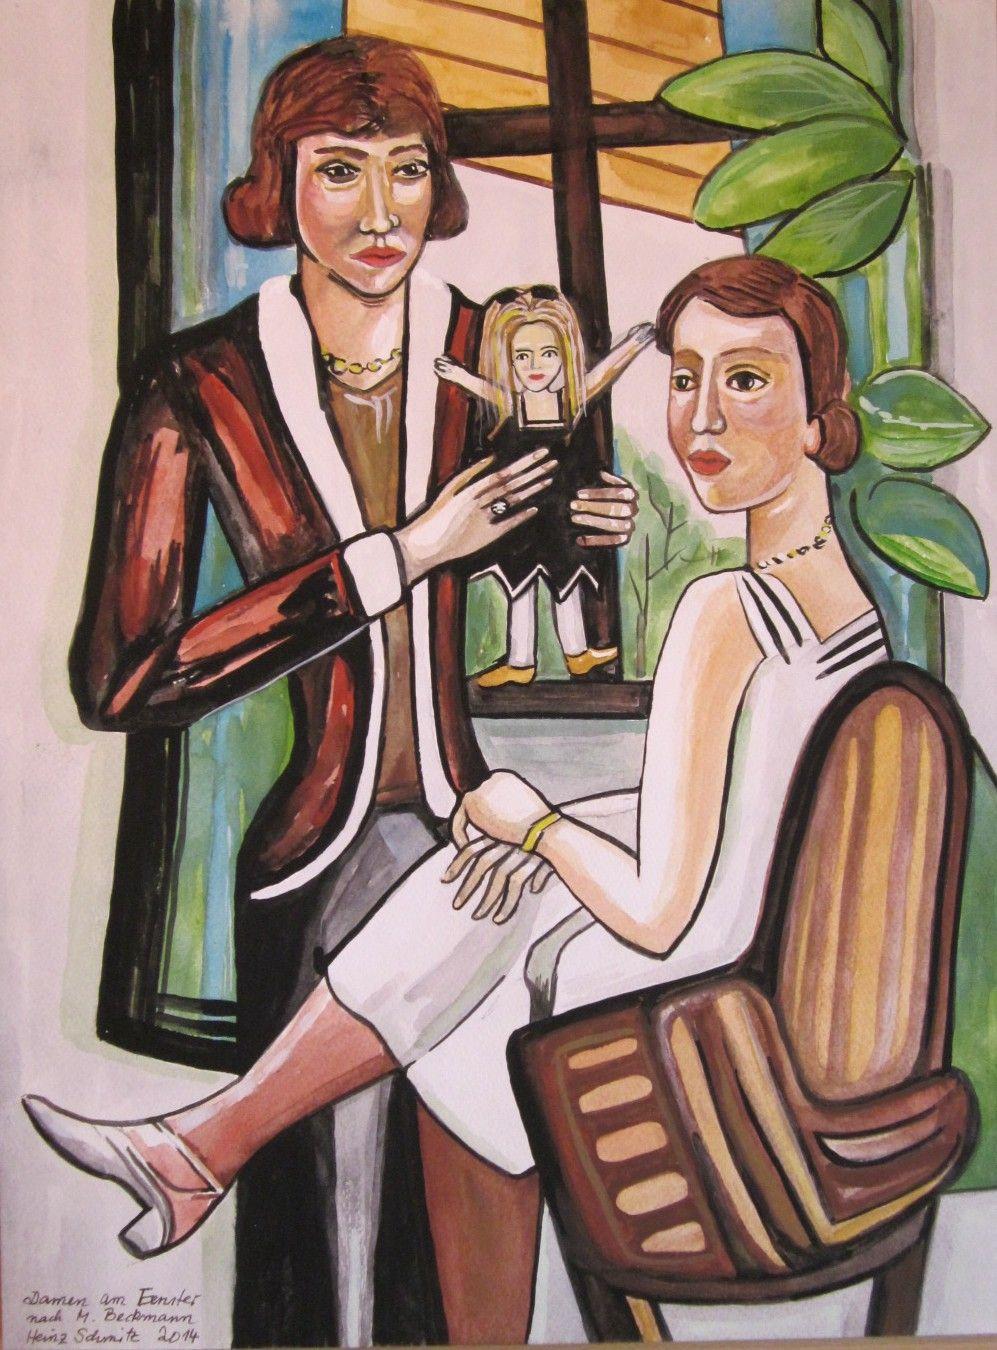 Bild klassische moderne heinz schmitz malerei menschen for Klassische moderne